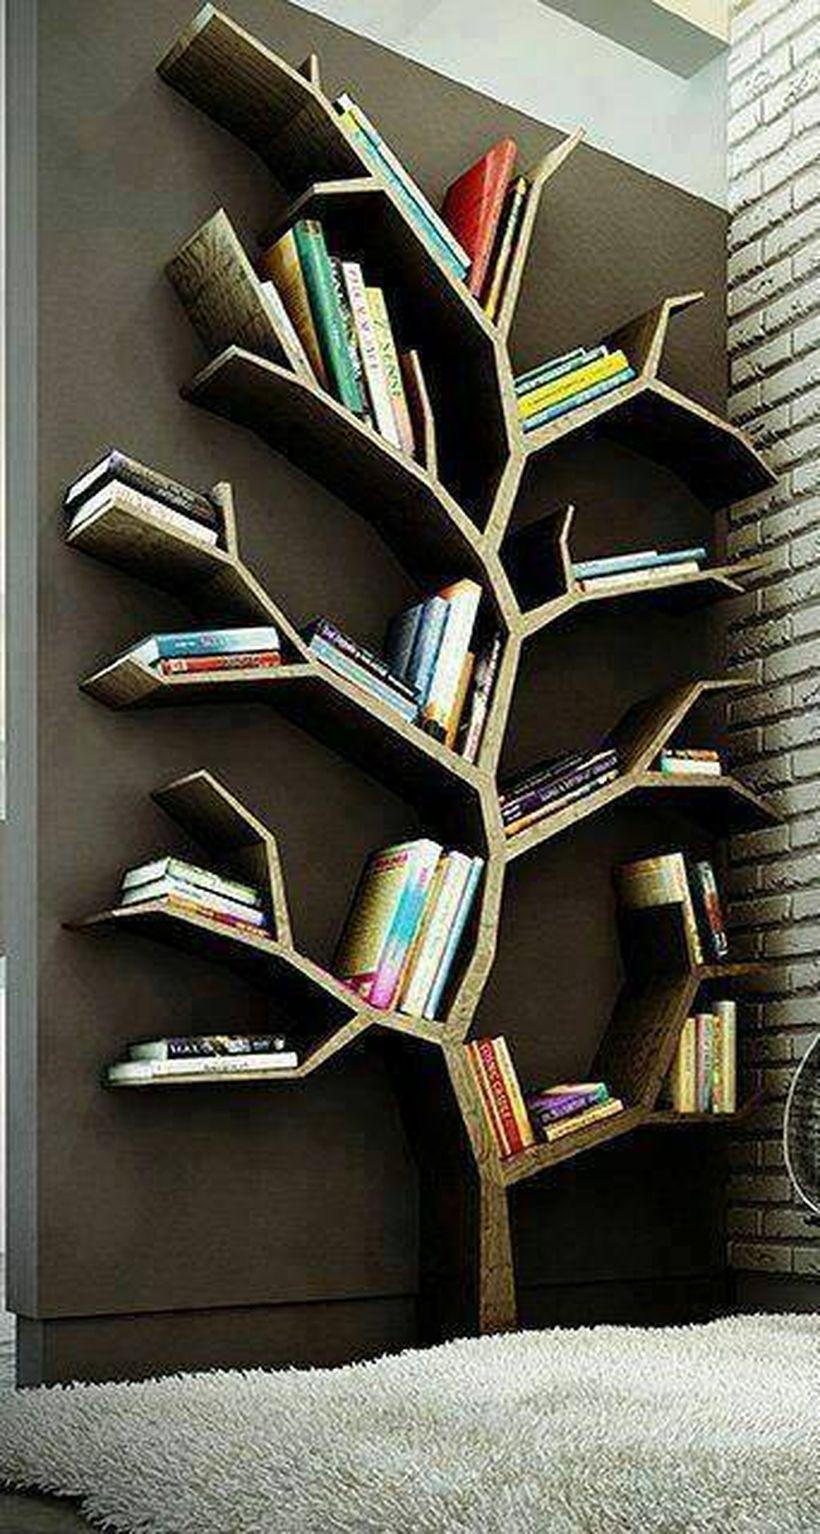 25 Stunning Creative Bookshelves Design Ideas   Bookshelf design ...